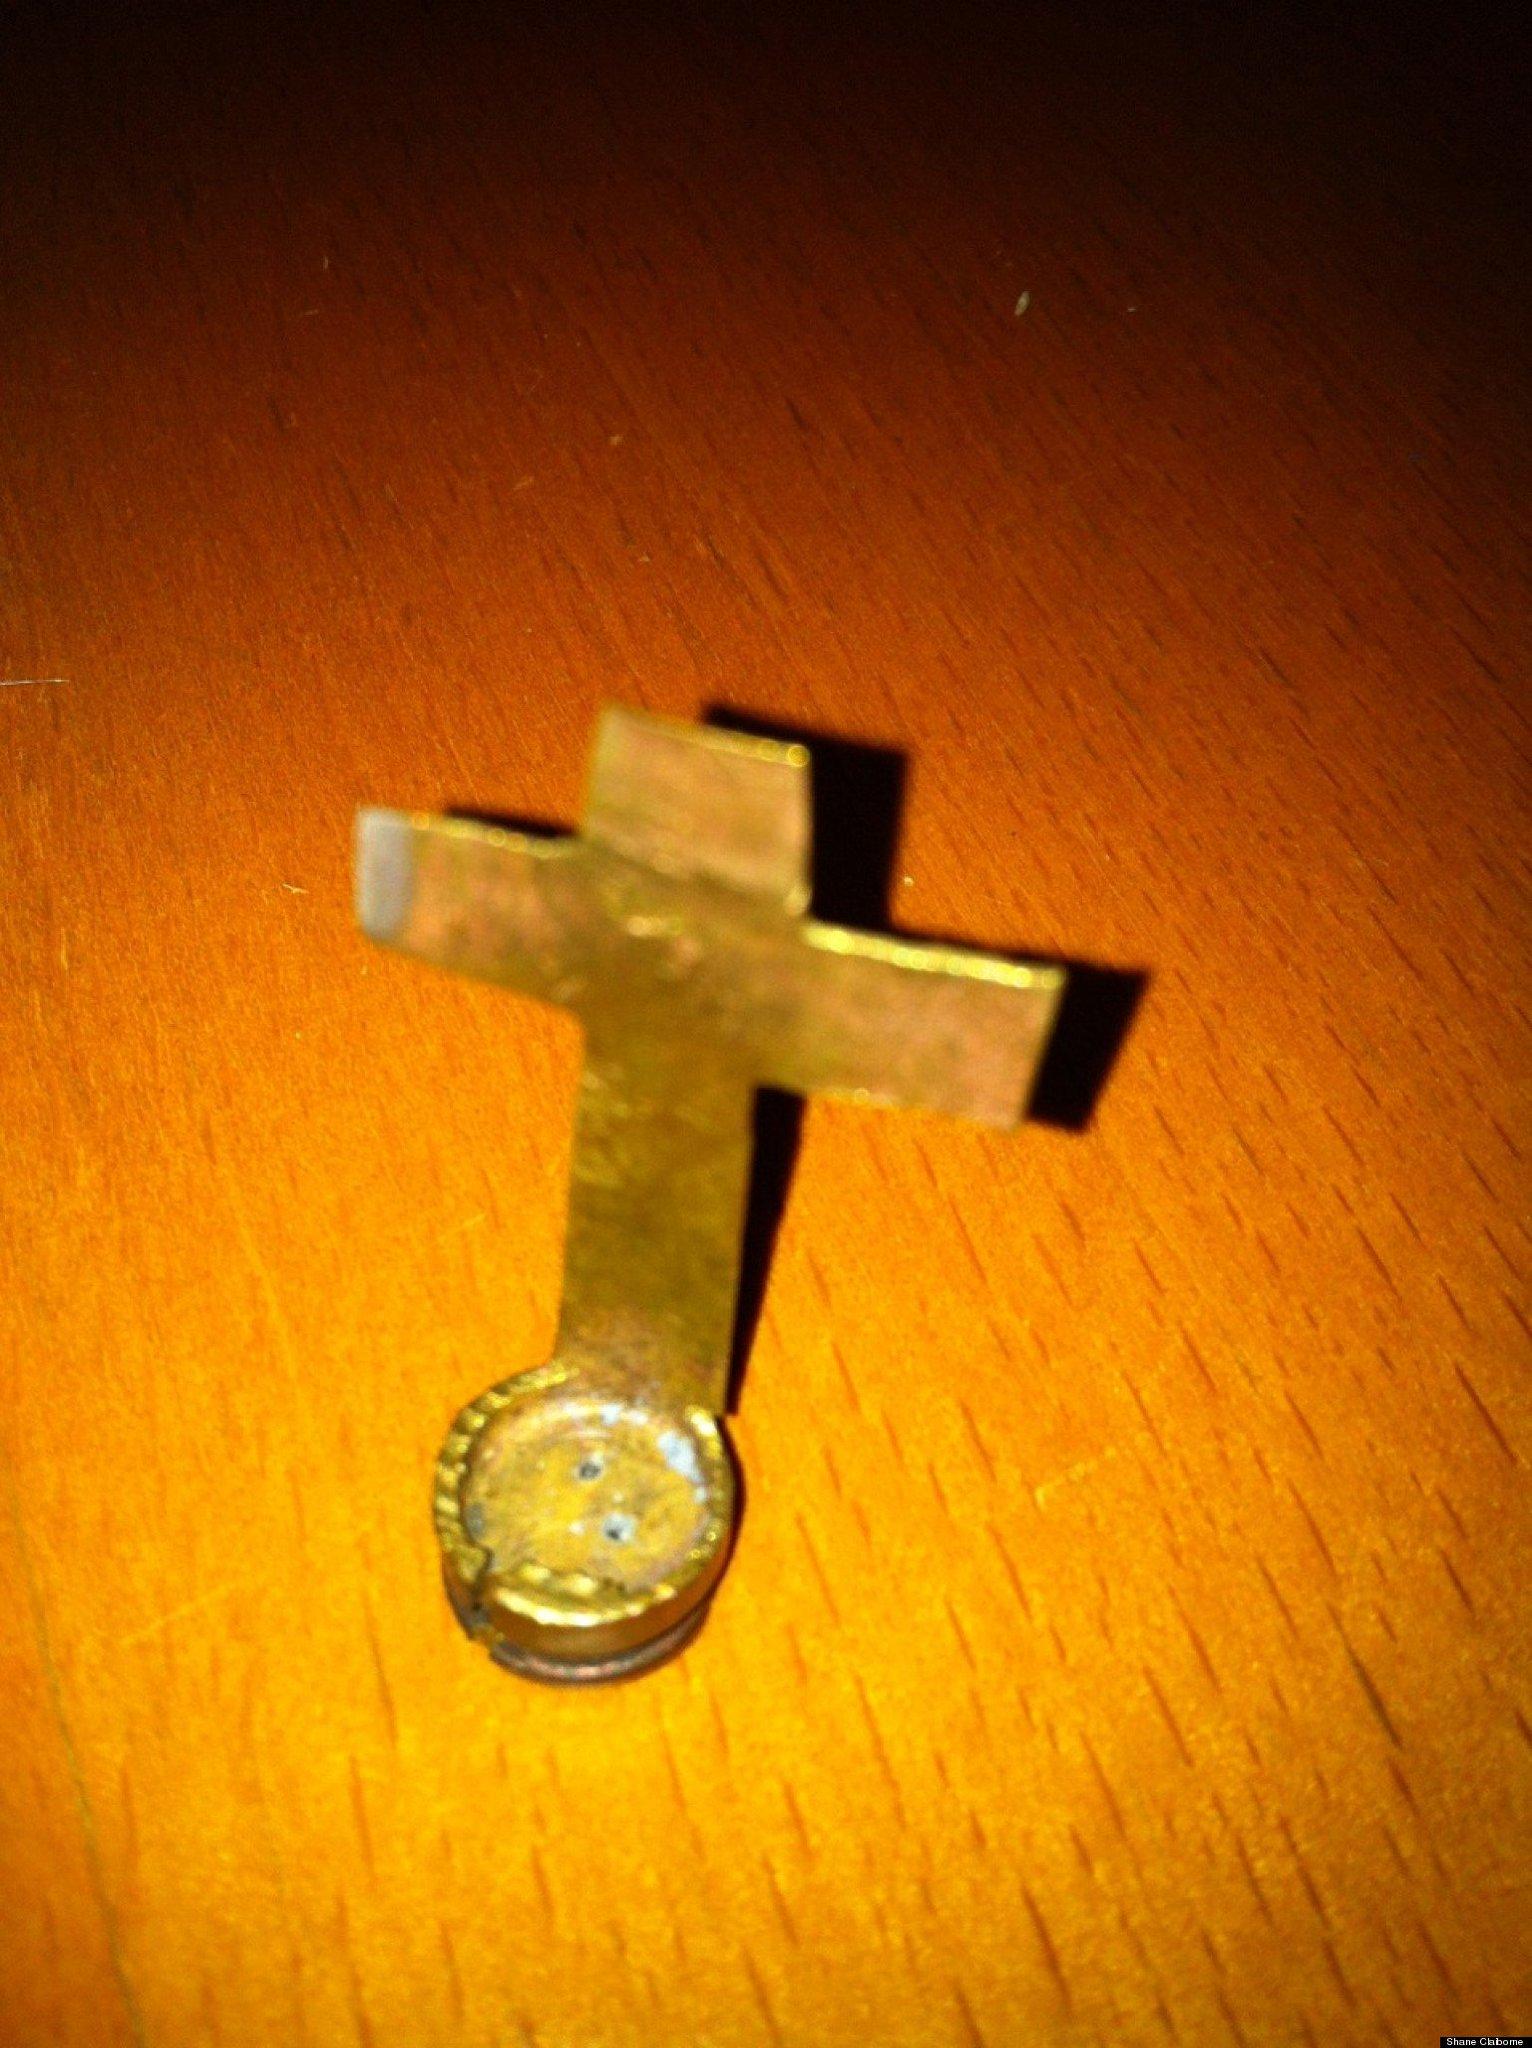 @shaneclaiborne Taking Good Friday Liturgy To The Streets https://t.co/wChHUsRvPw via @huffpost https://t.co/cuuaMK2SX4